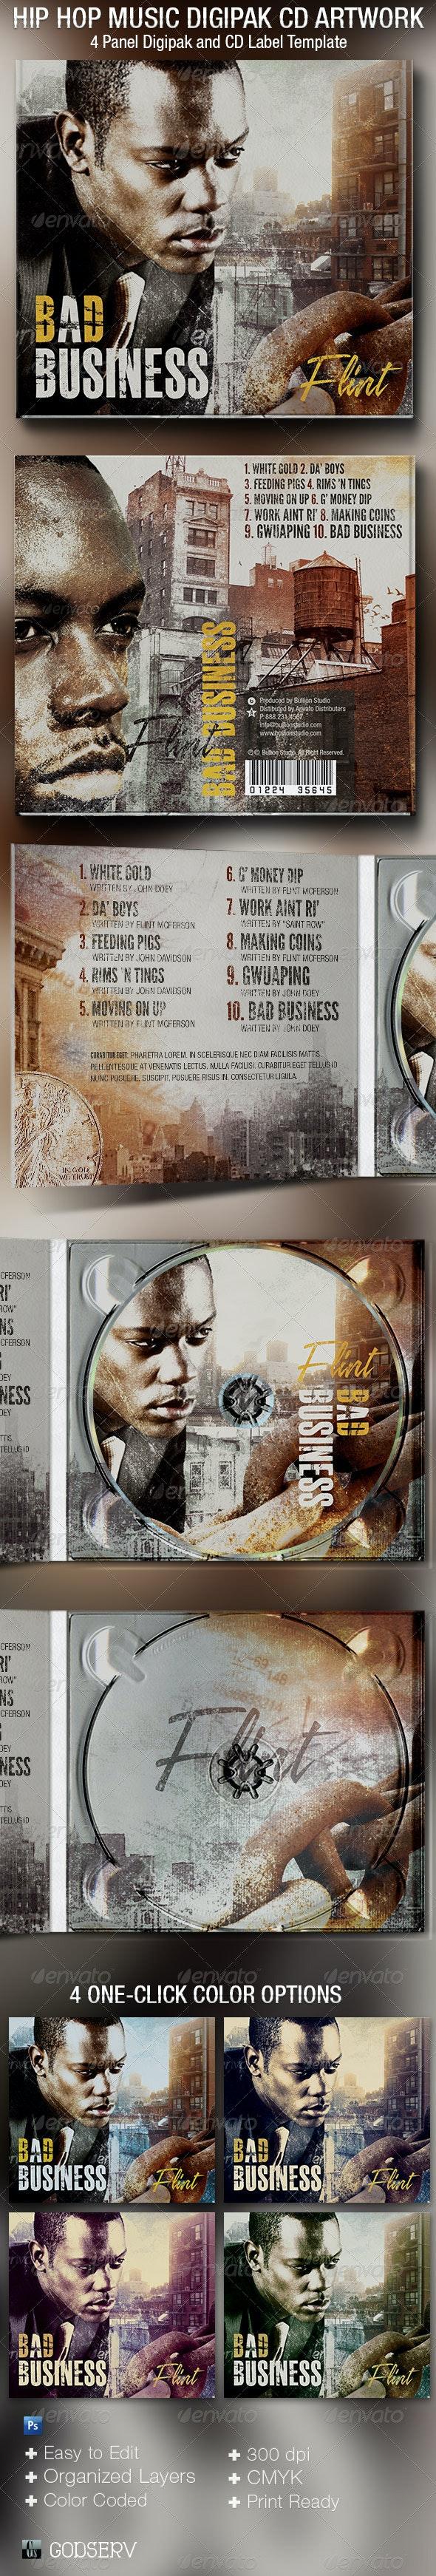 Hip Hop 4 Panel Digipak CD Artwork Template - CD & DVD Artwork Print Templates